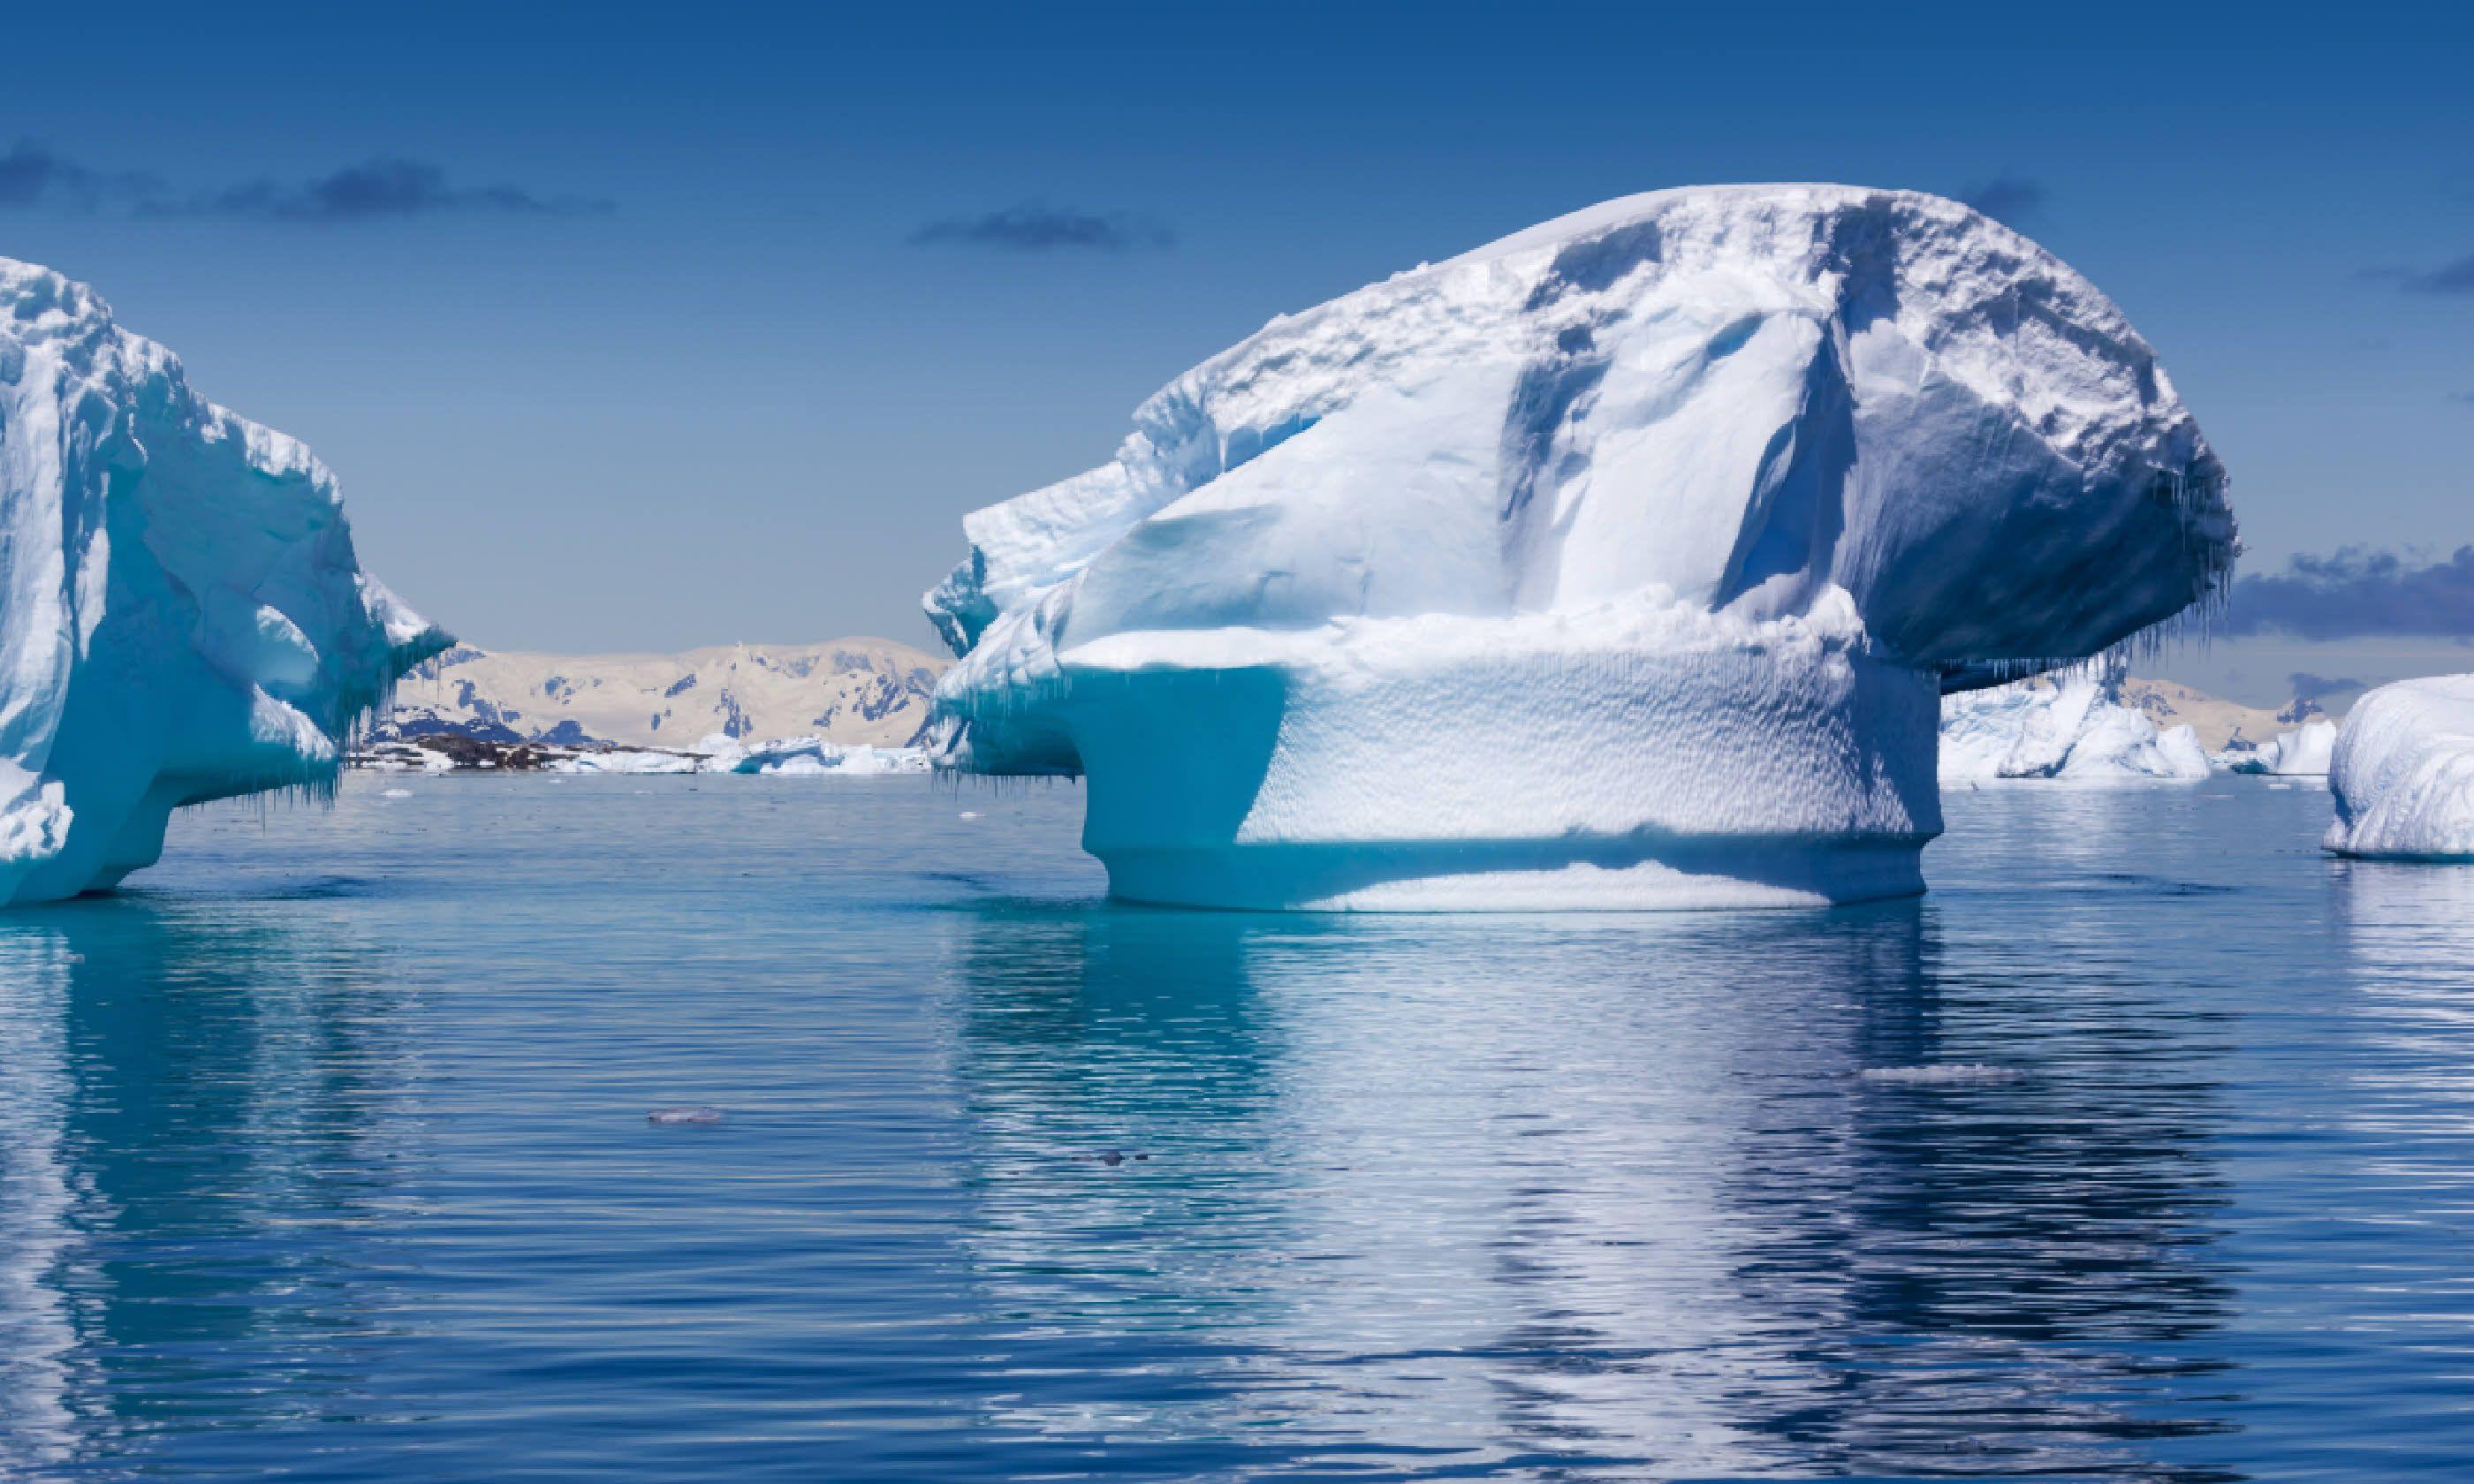 Antarctica icebergs (Shutterstock)